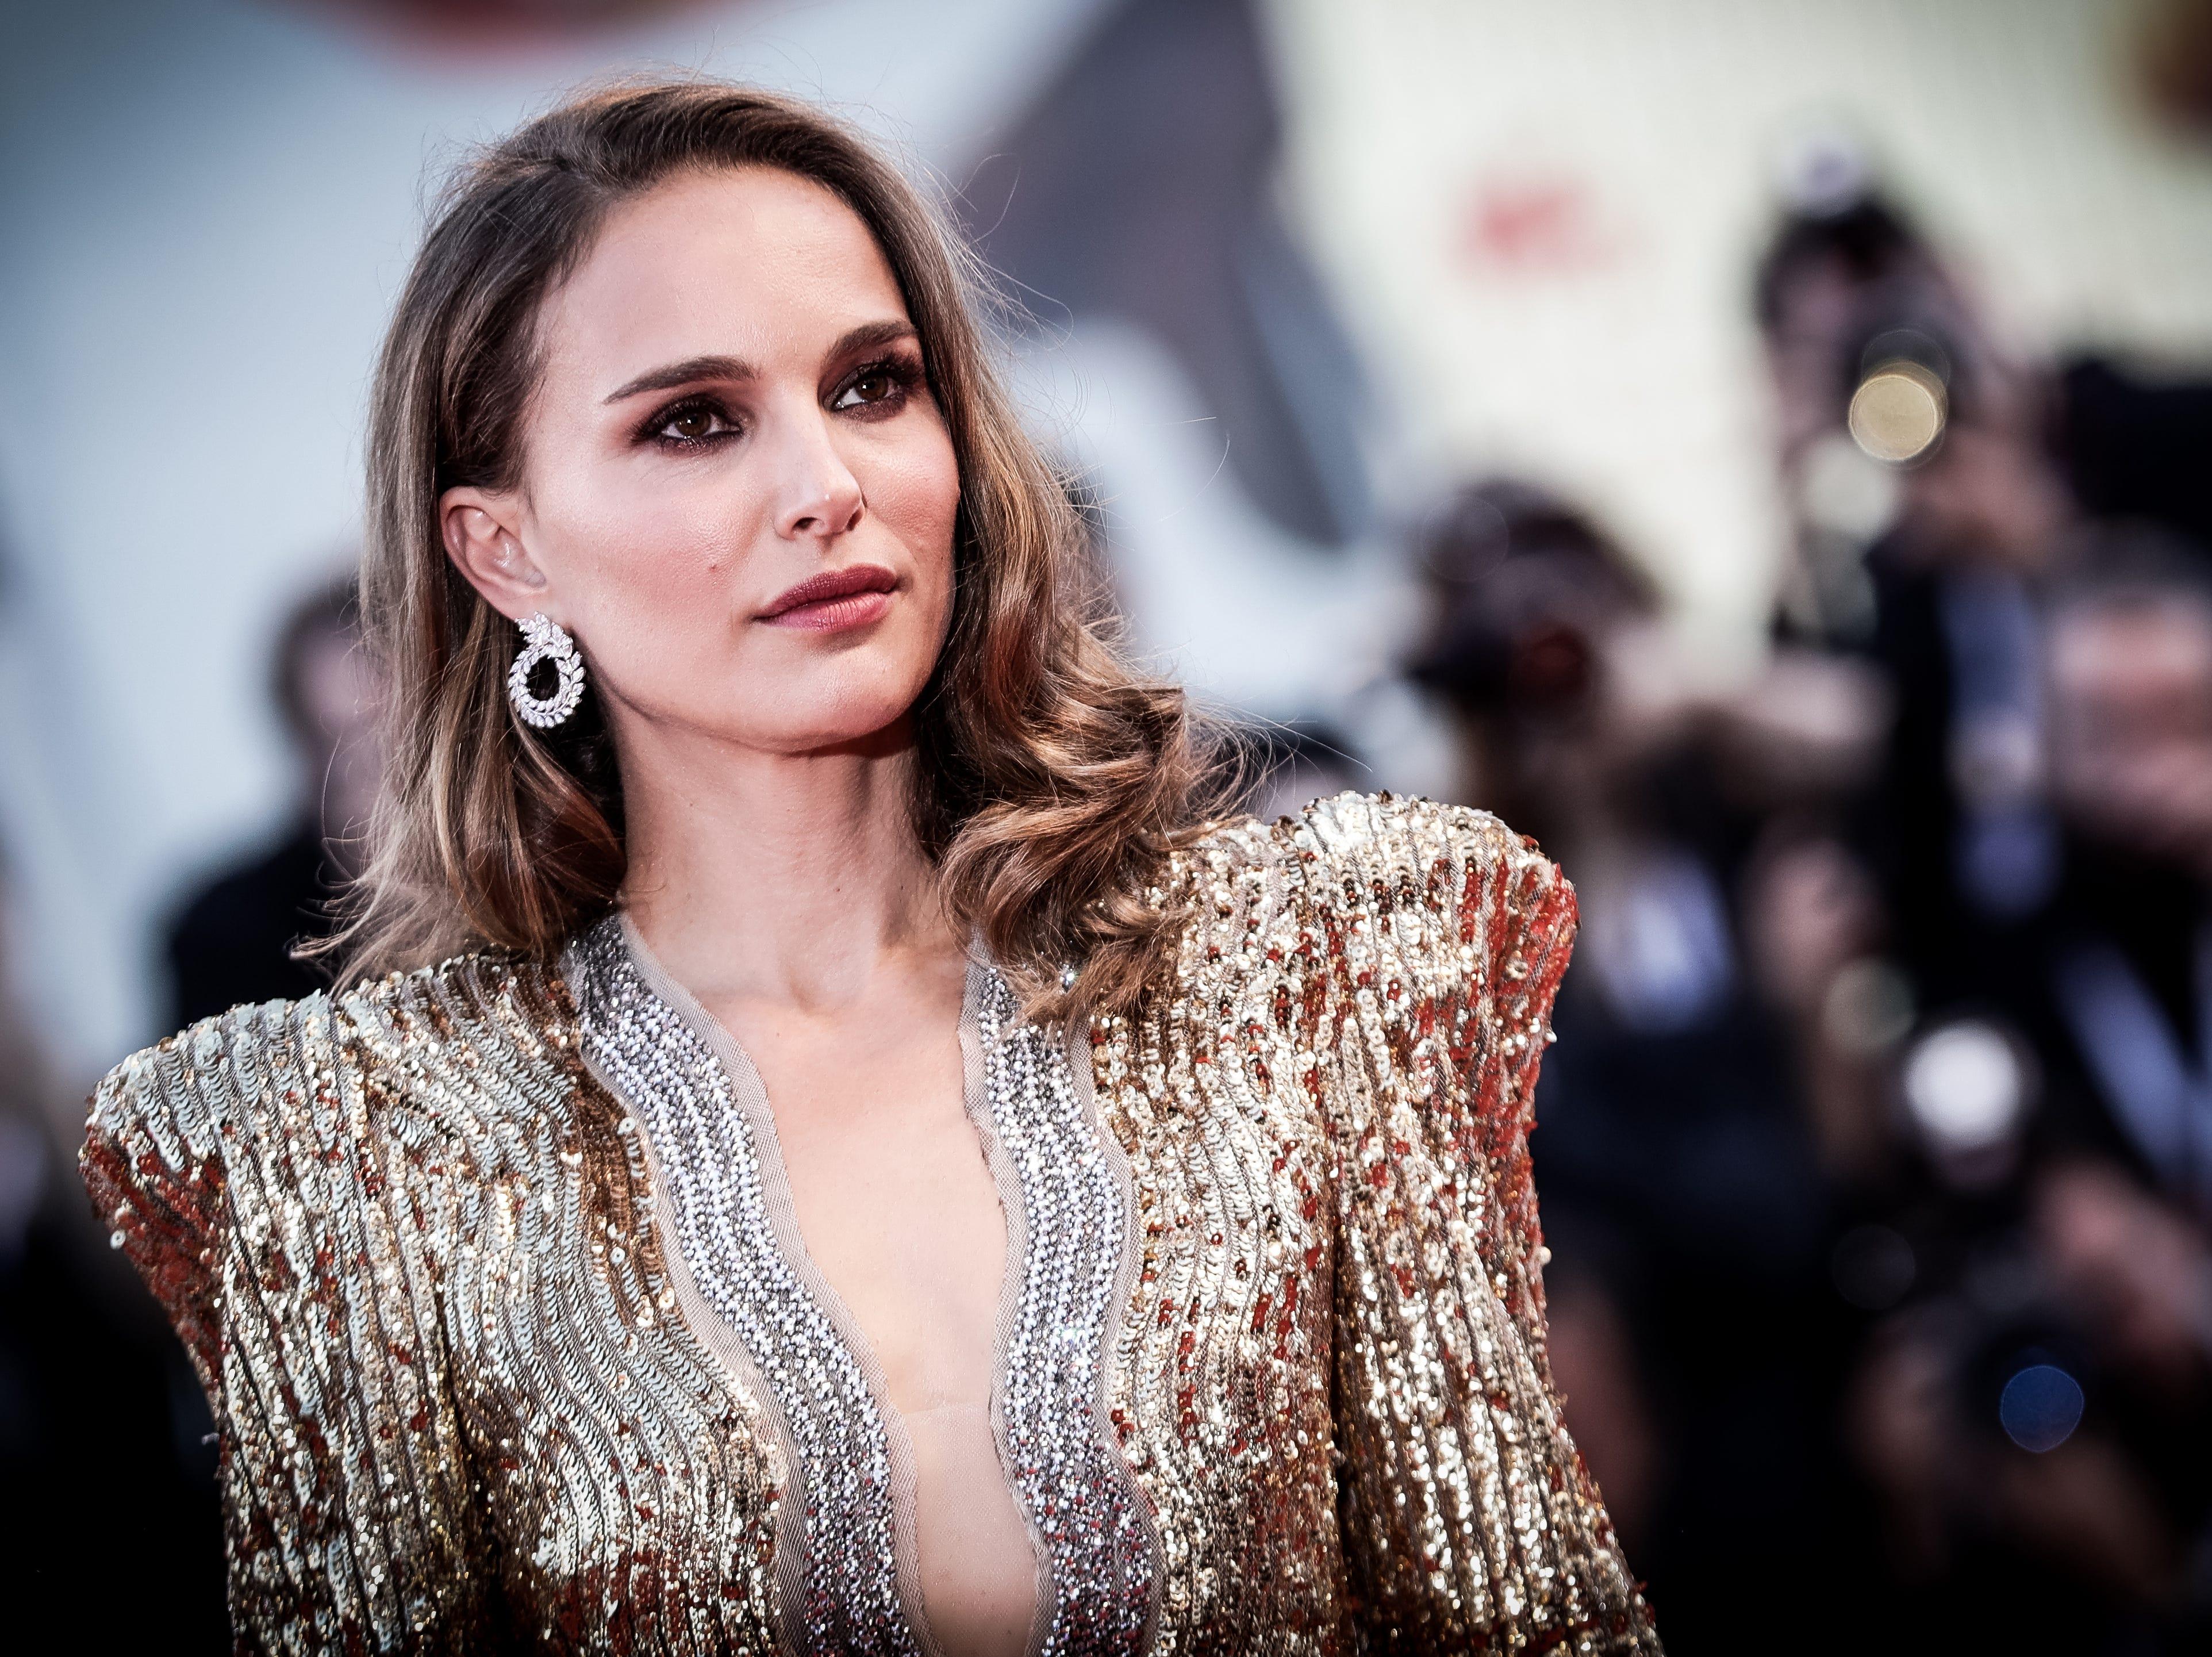 Natalie Portman walks the red carpet ahead of the 'Vox Lux' screening.